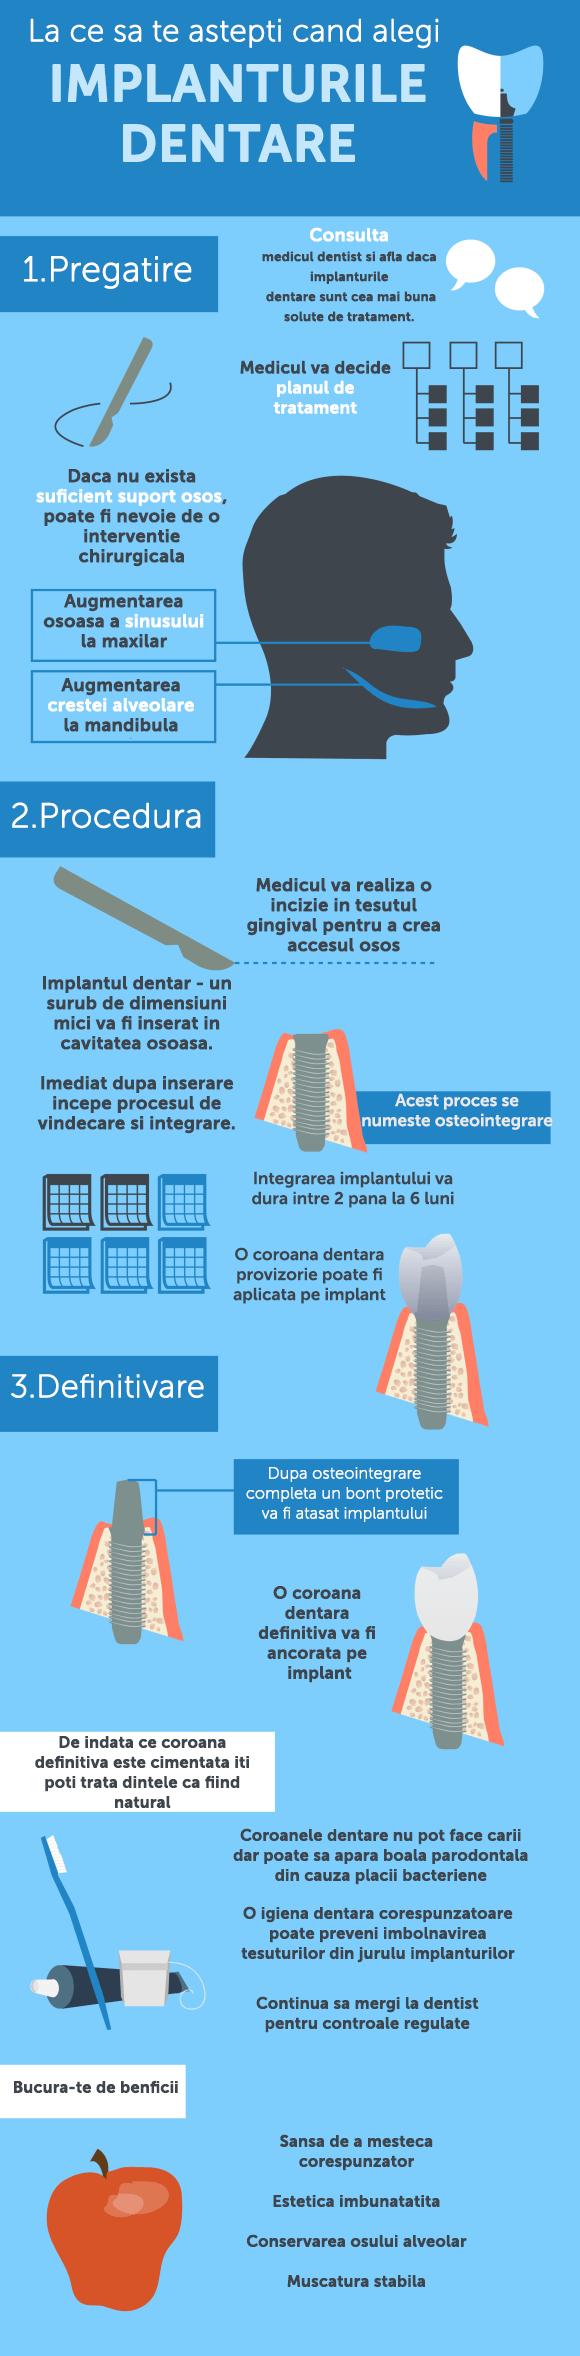 What to Expect When Getting Dental Implants Infographic 012 copy - Cum se insera un implant dentar? Ce trebuie sa stim despre implanturile dentare?